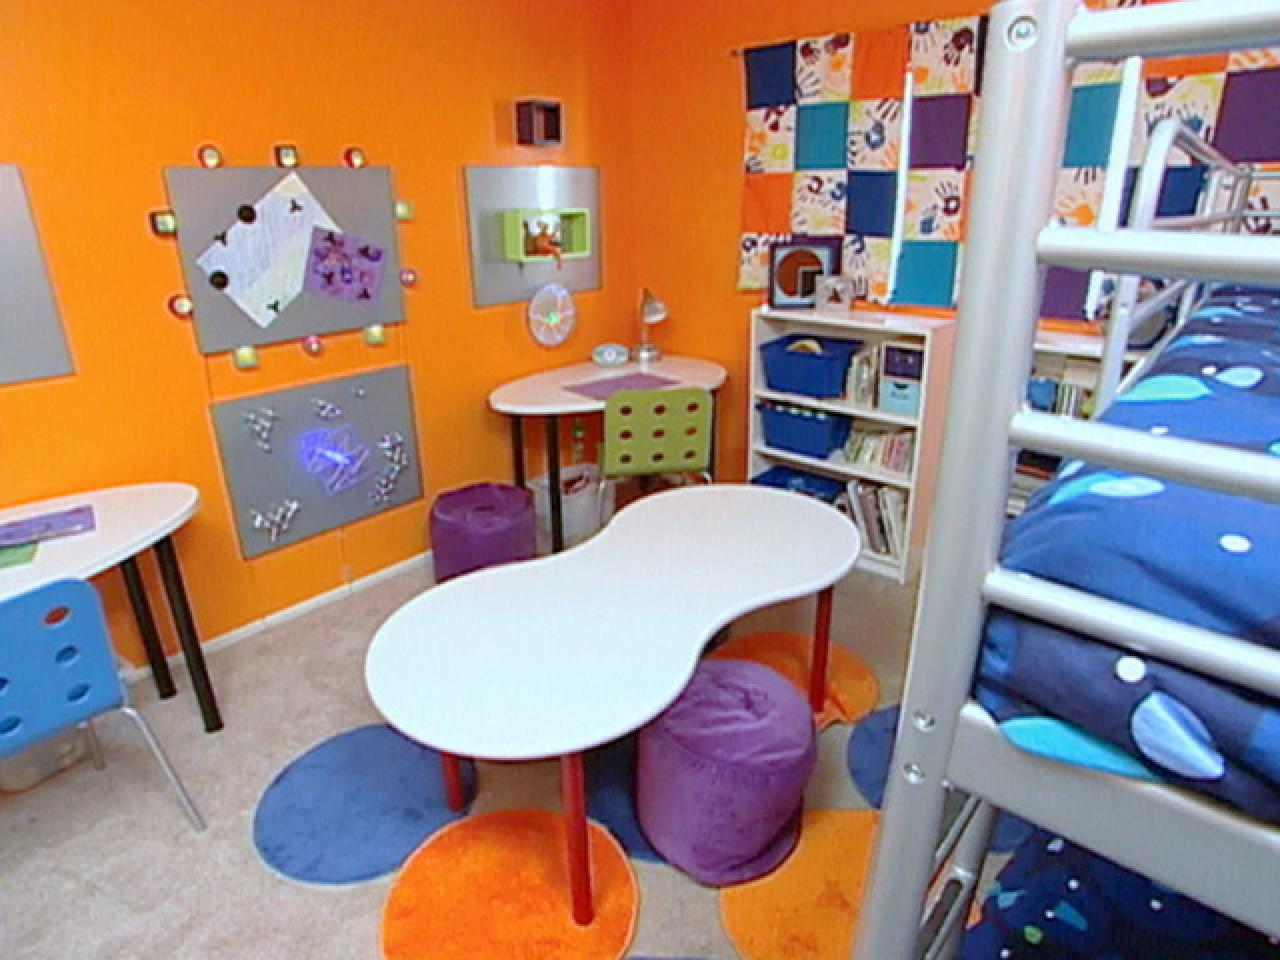 Making Your Kids' Bedrooms Destruction-proof